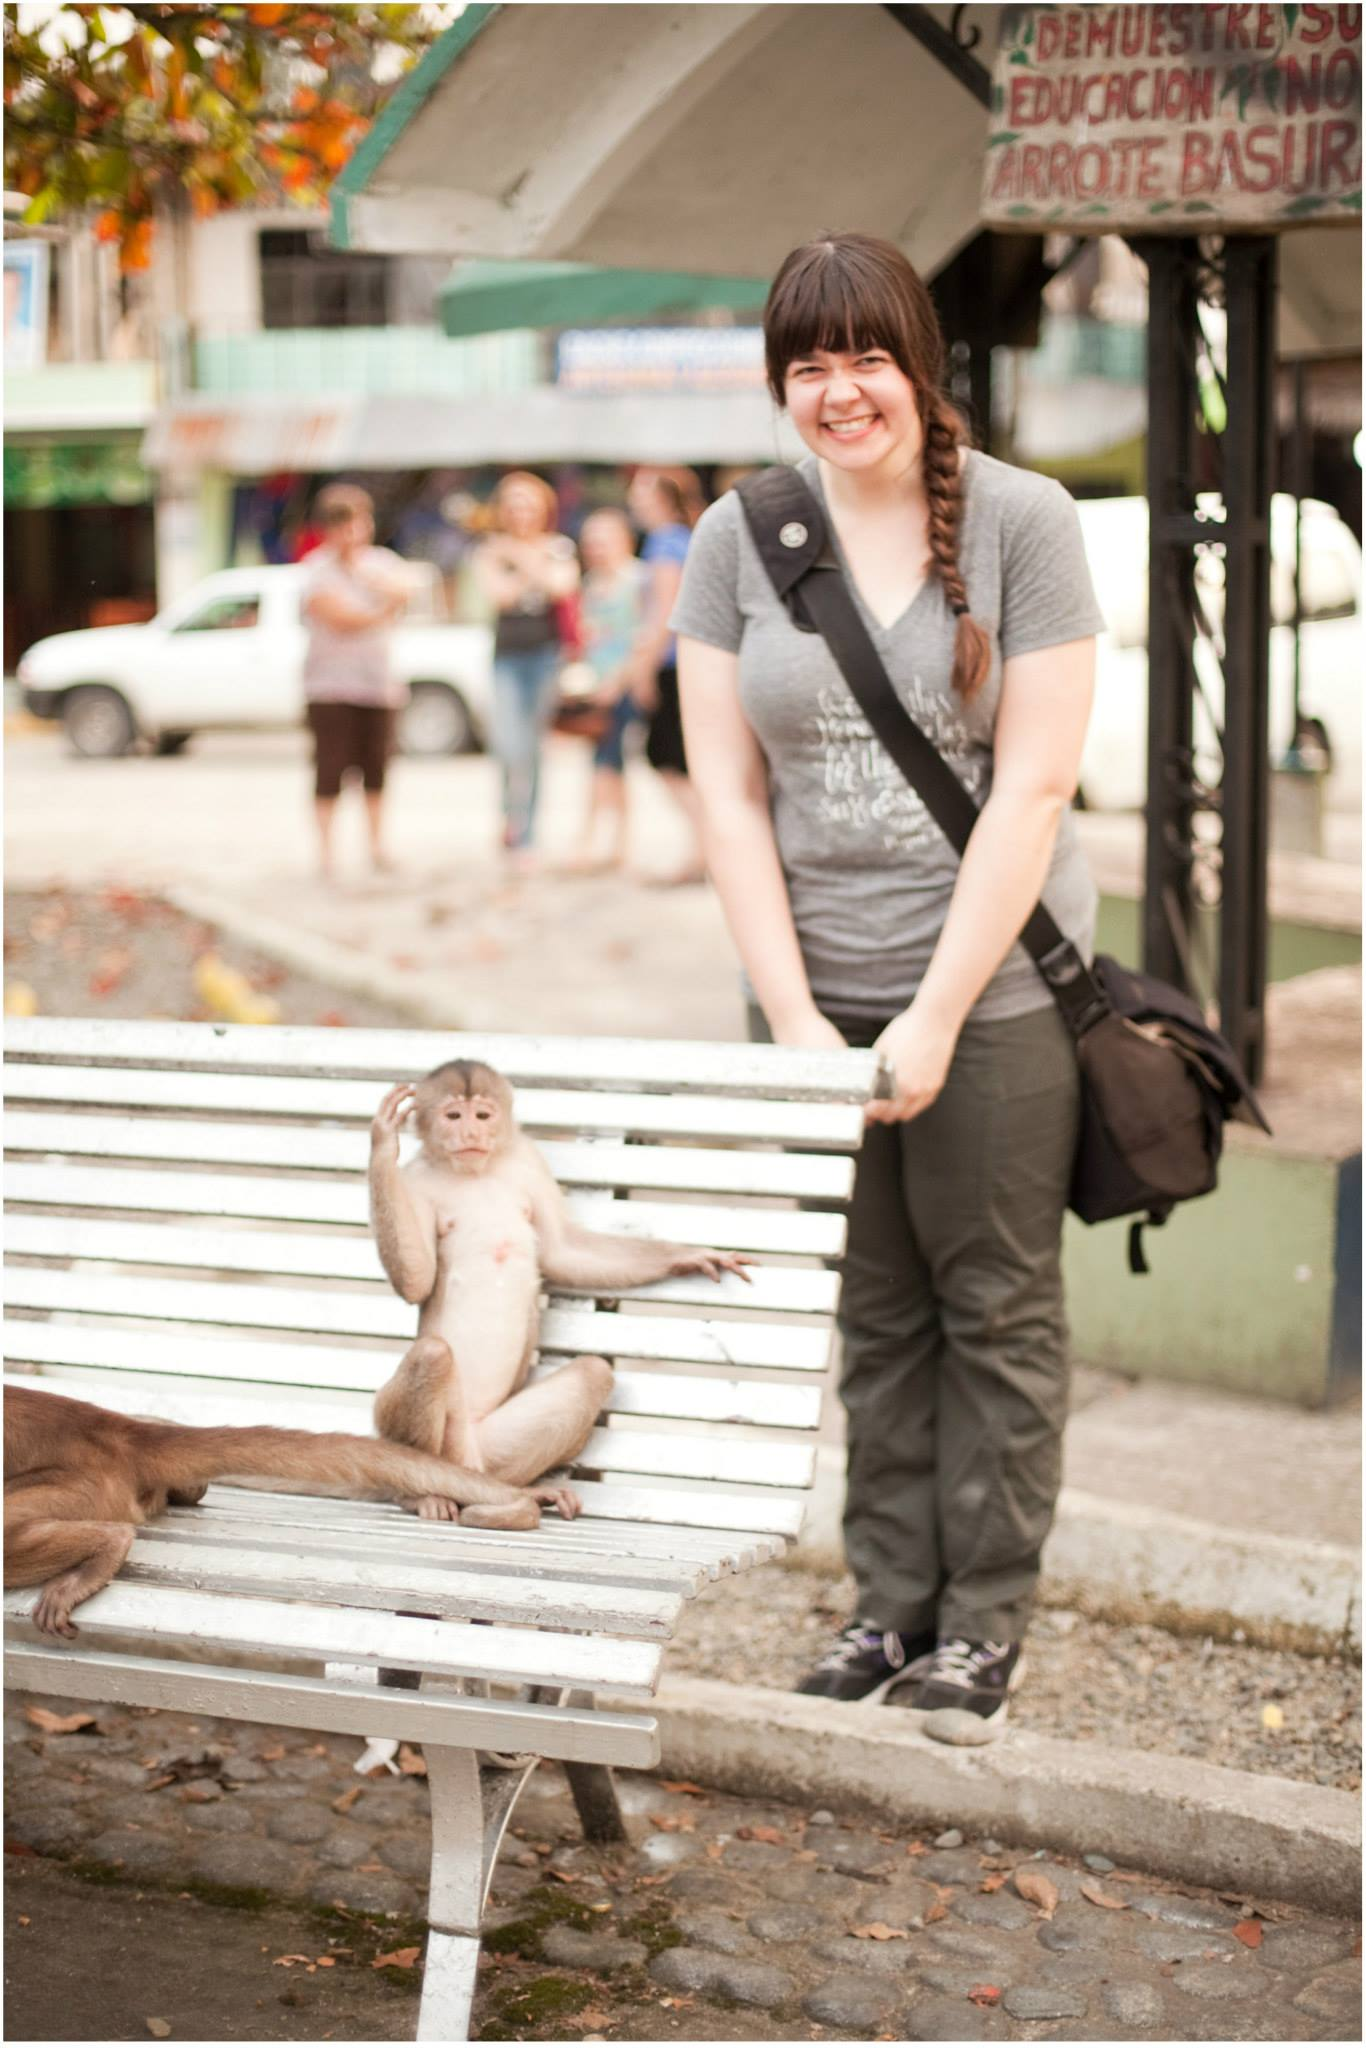 ecuador-monkey-photo-kristin-ungerecht.jpg